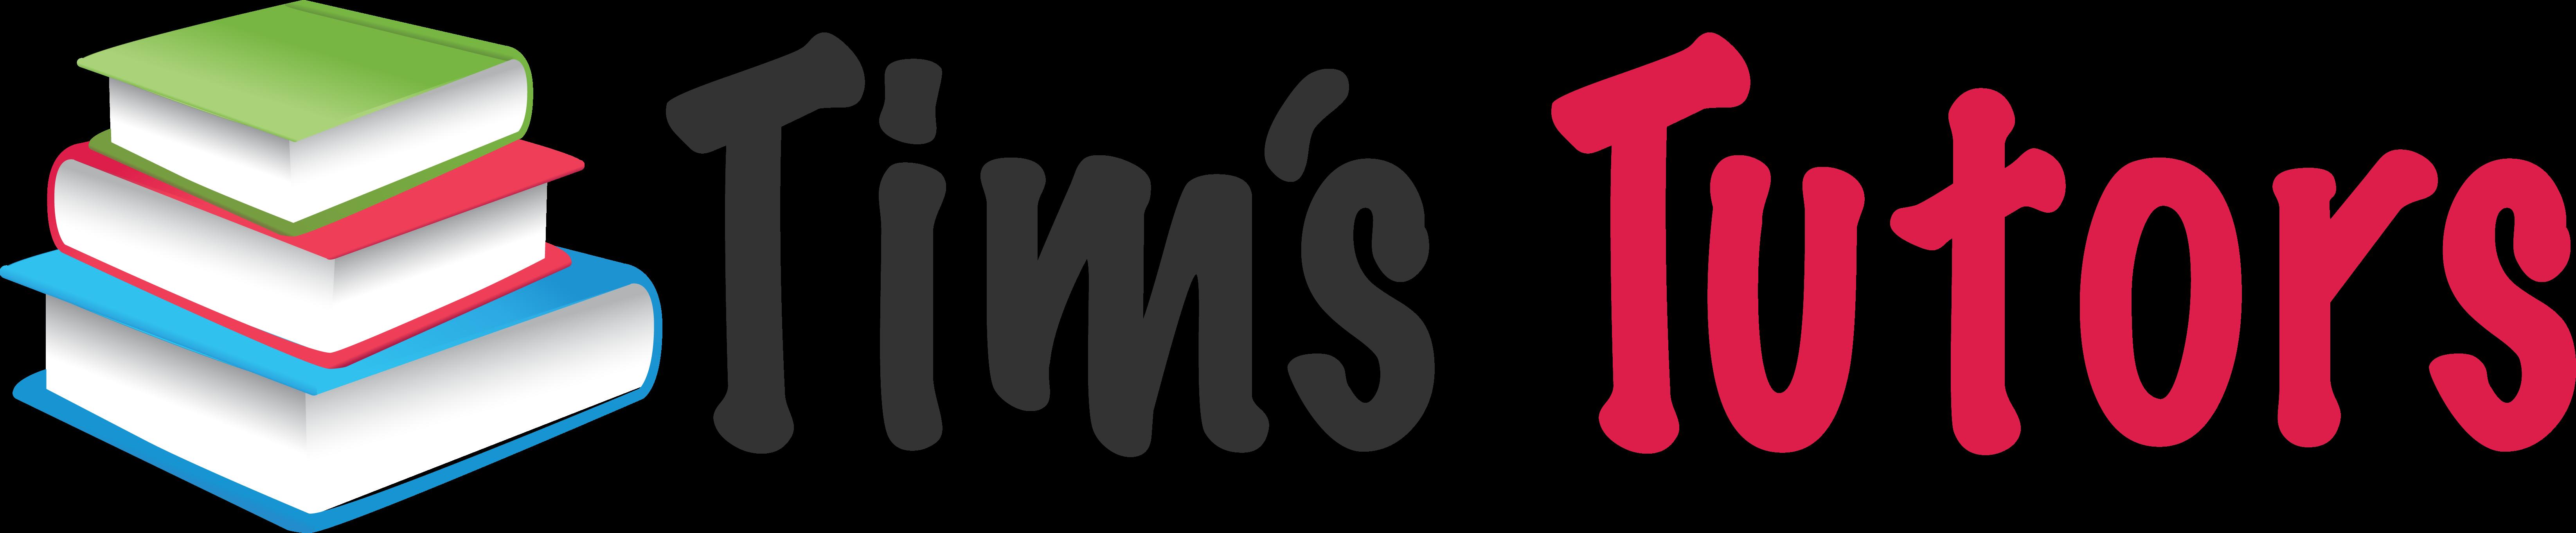 cropped-timstutors-logo.png